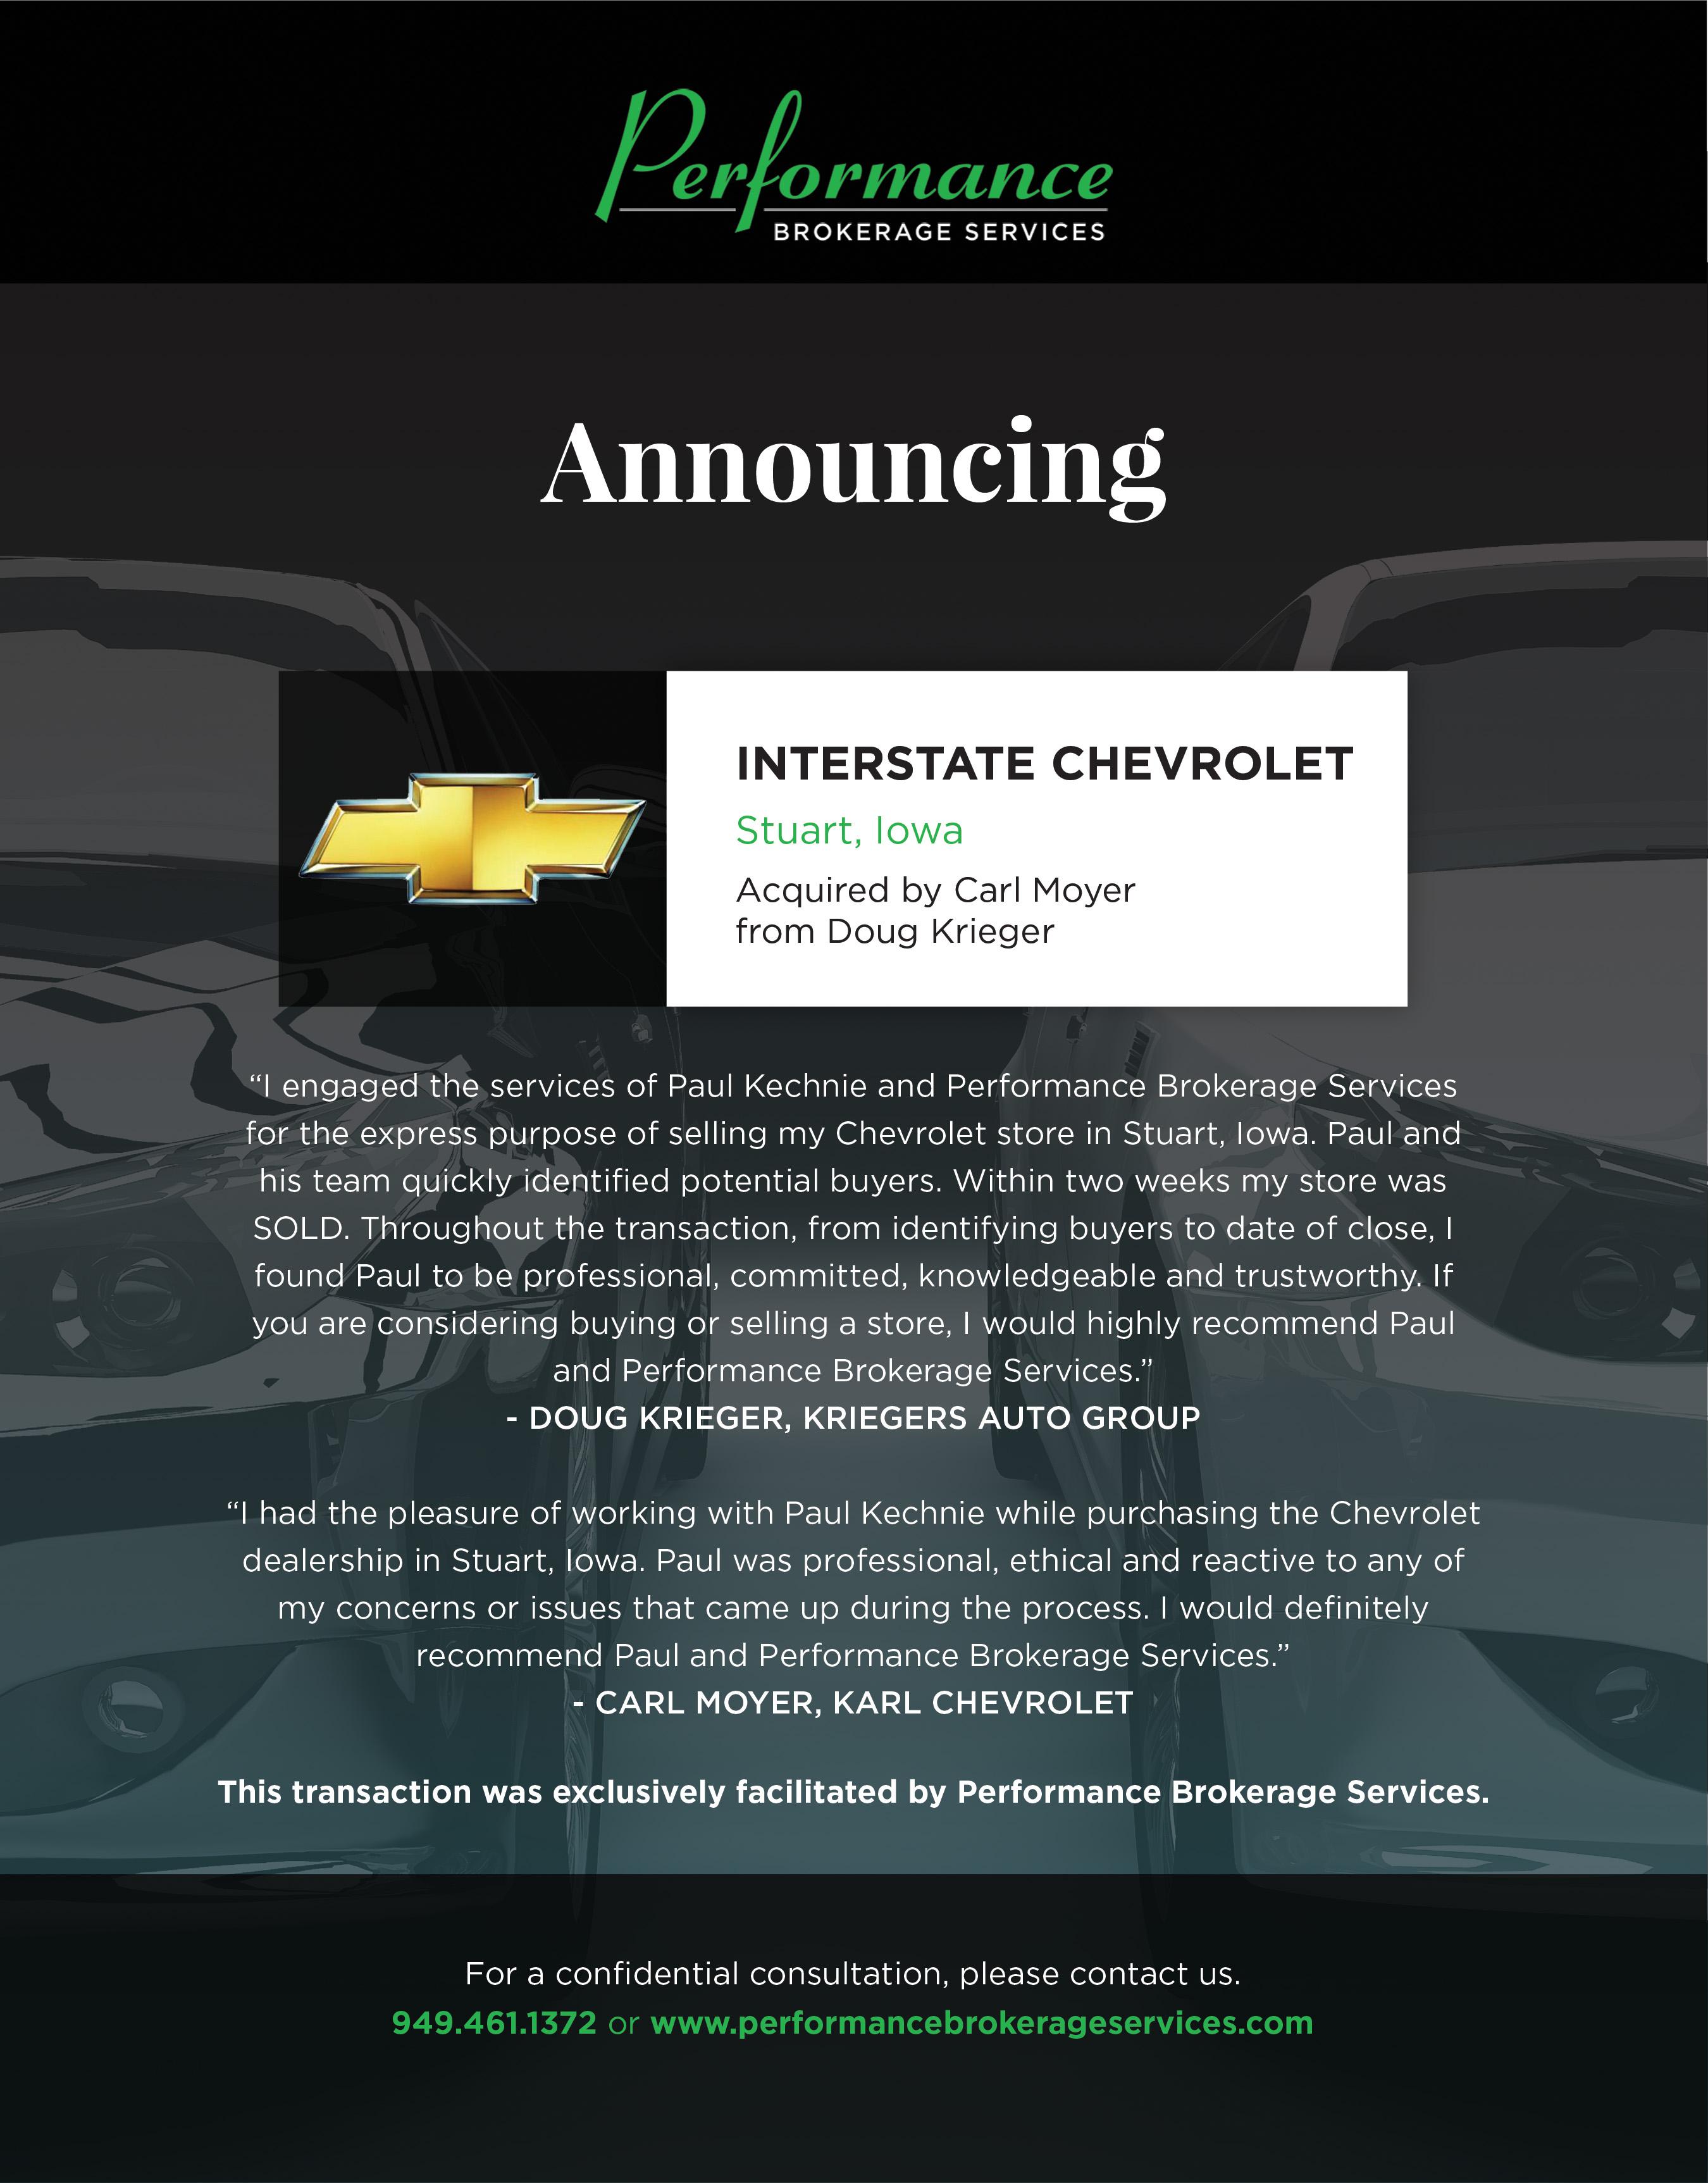 Doug Krieger Sells Interstate Chevrolet In Stuart Iowa Performance Brokerage Services